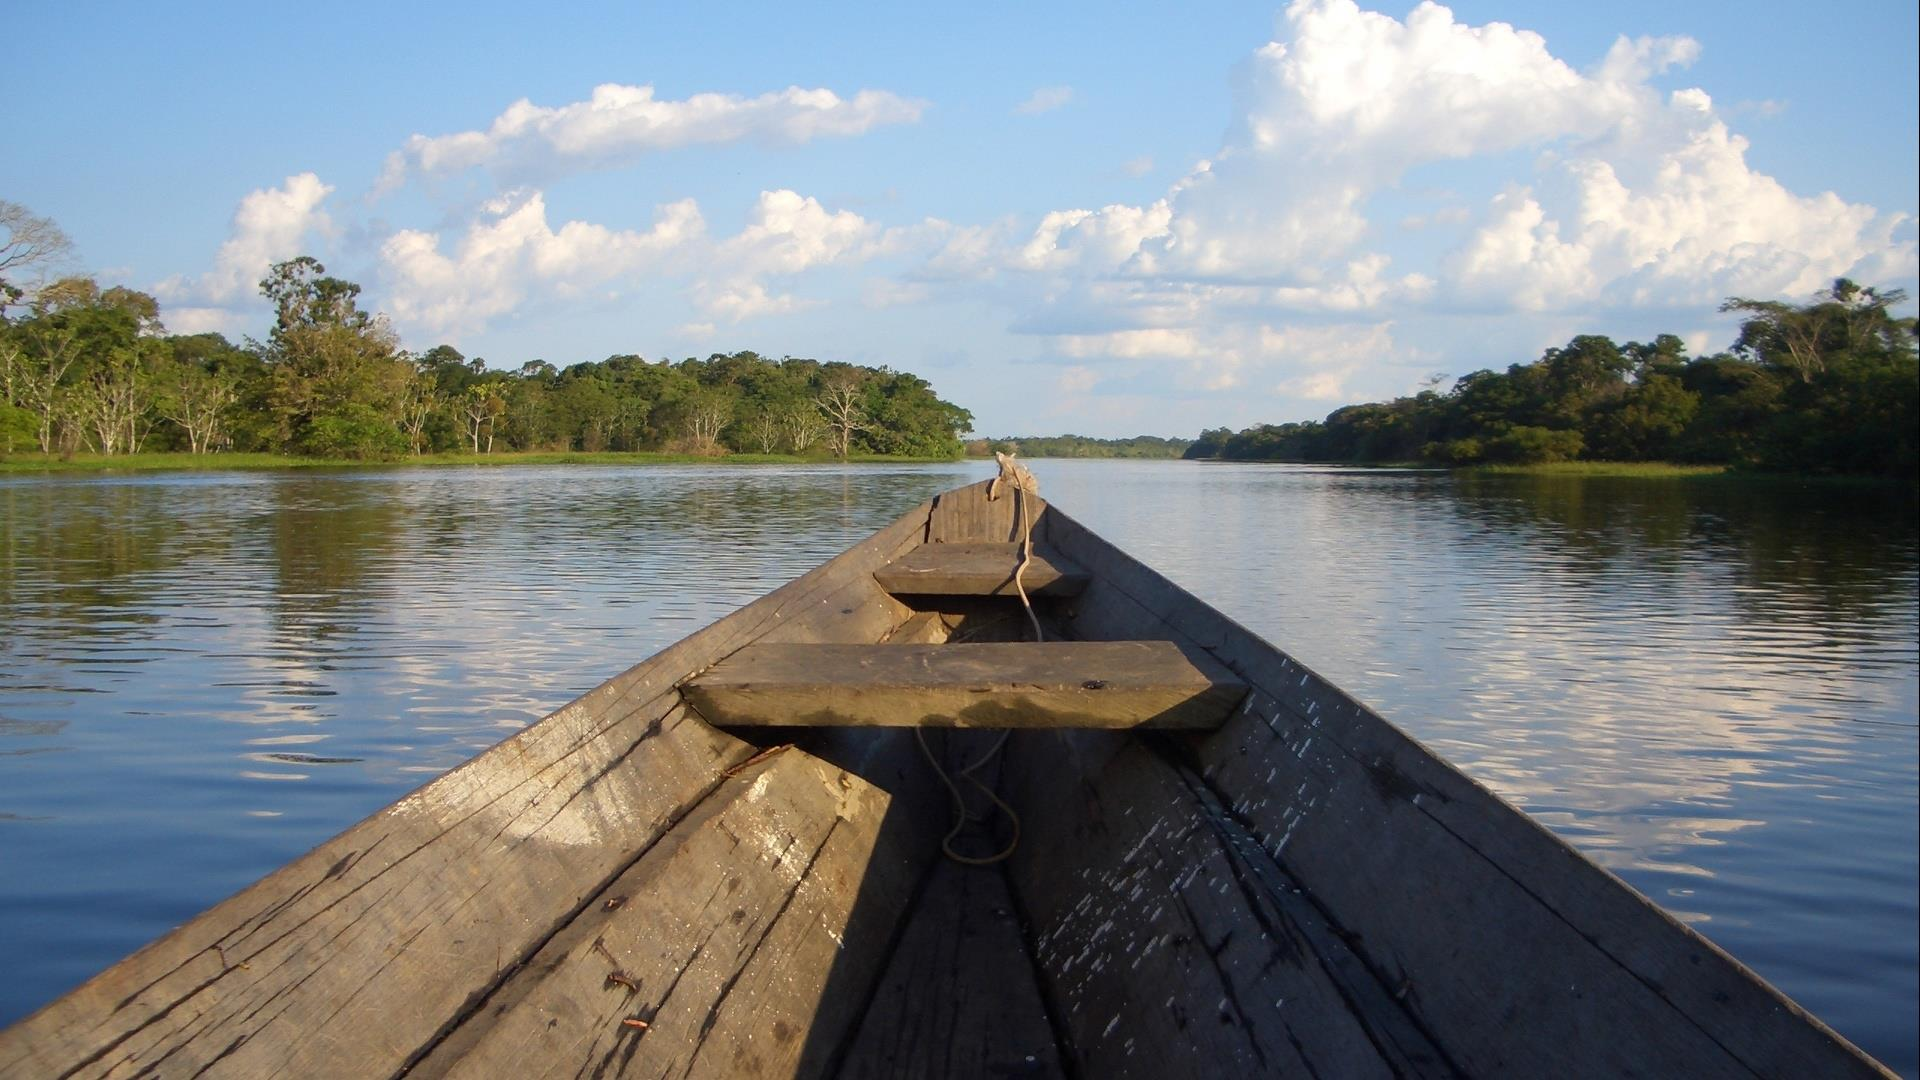 Brasilien Amazonas: 6 Tage Reisebaustein - Juma Amazon Lodge Selva Paket